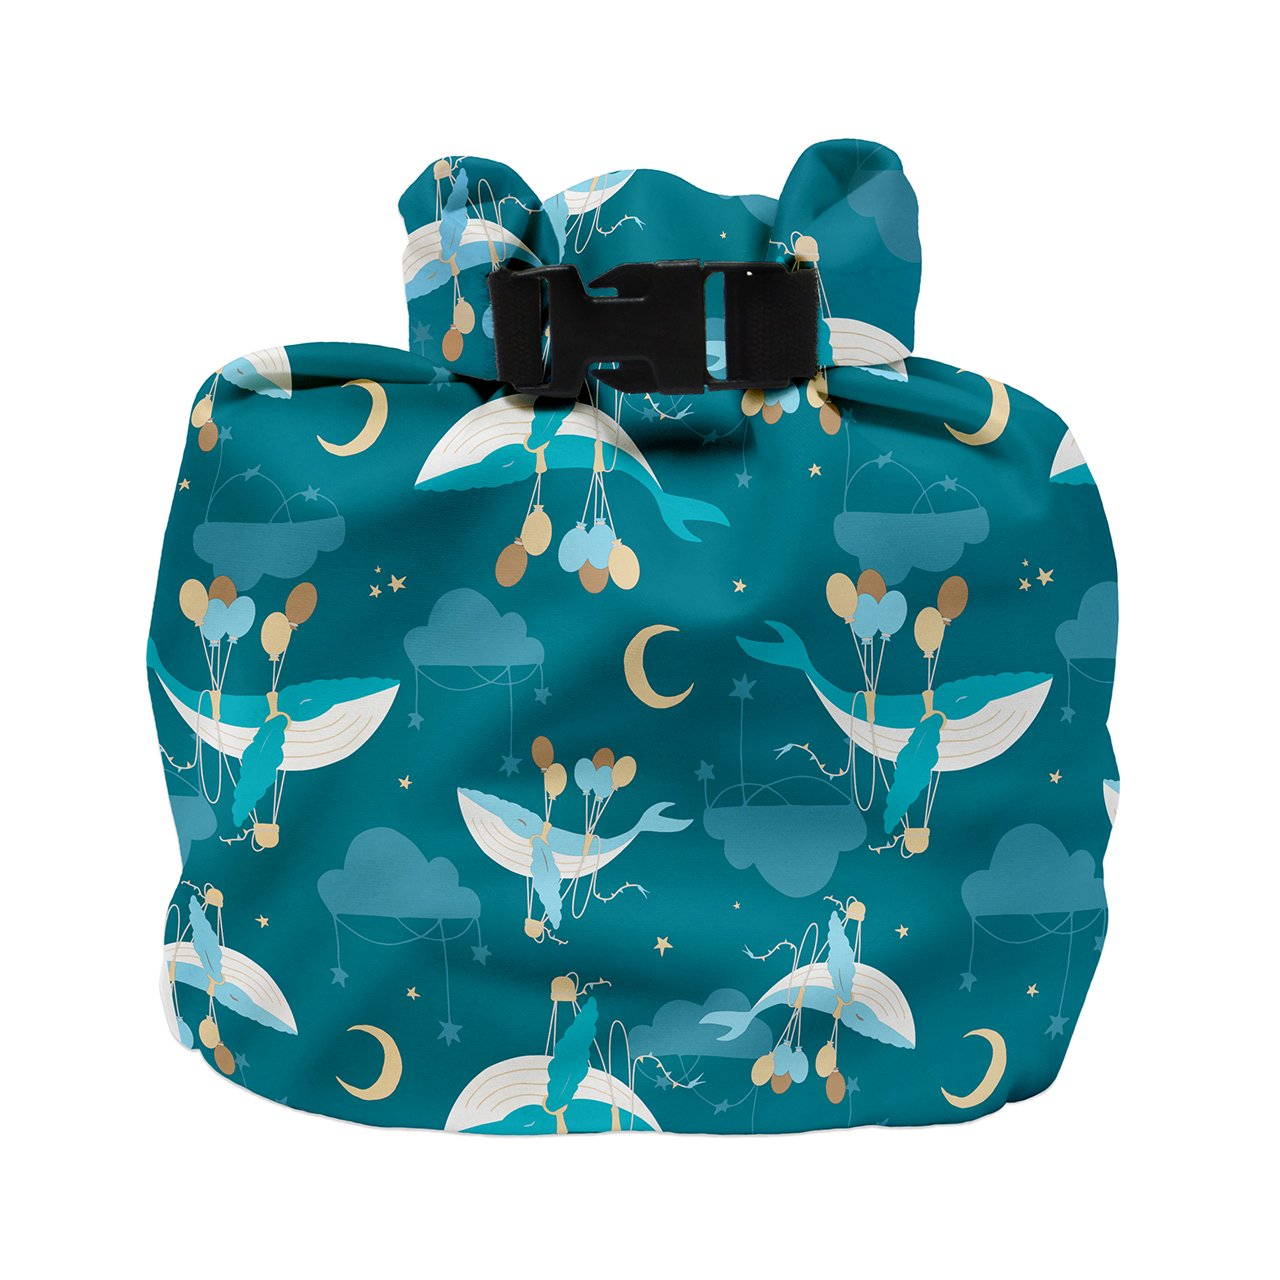 Bambino Mio, wet bag, spider monkey Bambino Mio UK WNB MON